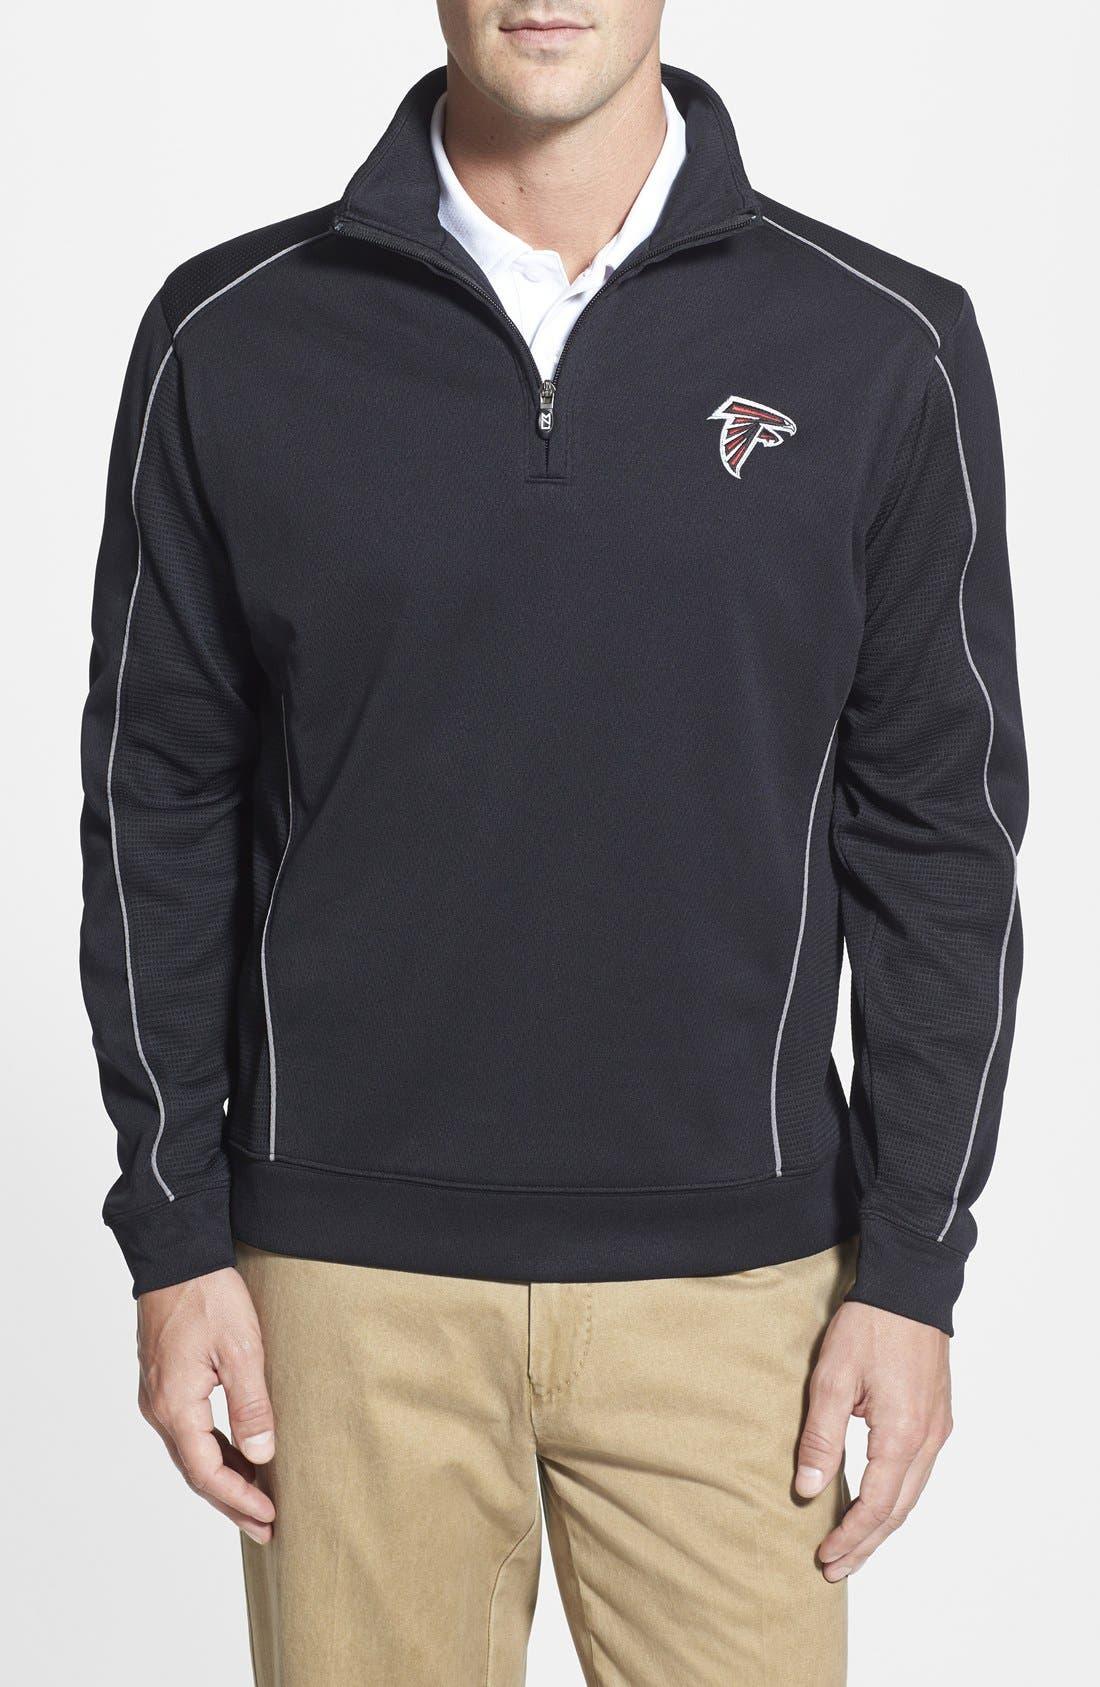 Atlanta Falcons - Edge DryTec Moisture Wicking Half Zip Pullover,                             Main thumbnail 1, color,                             Black